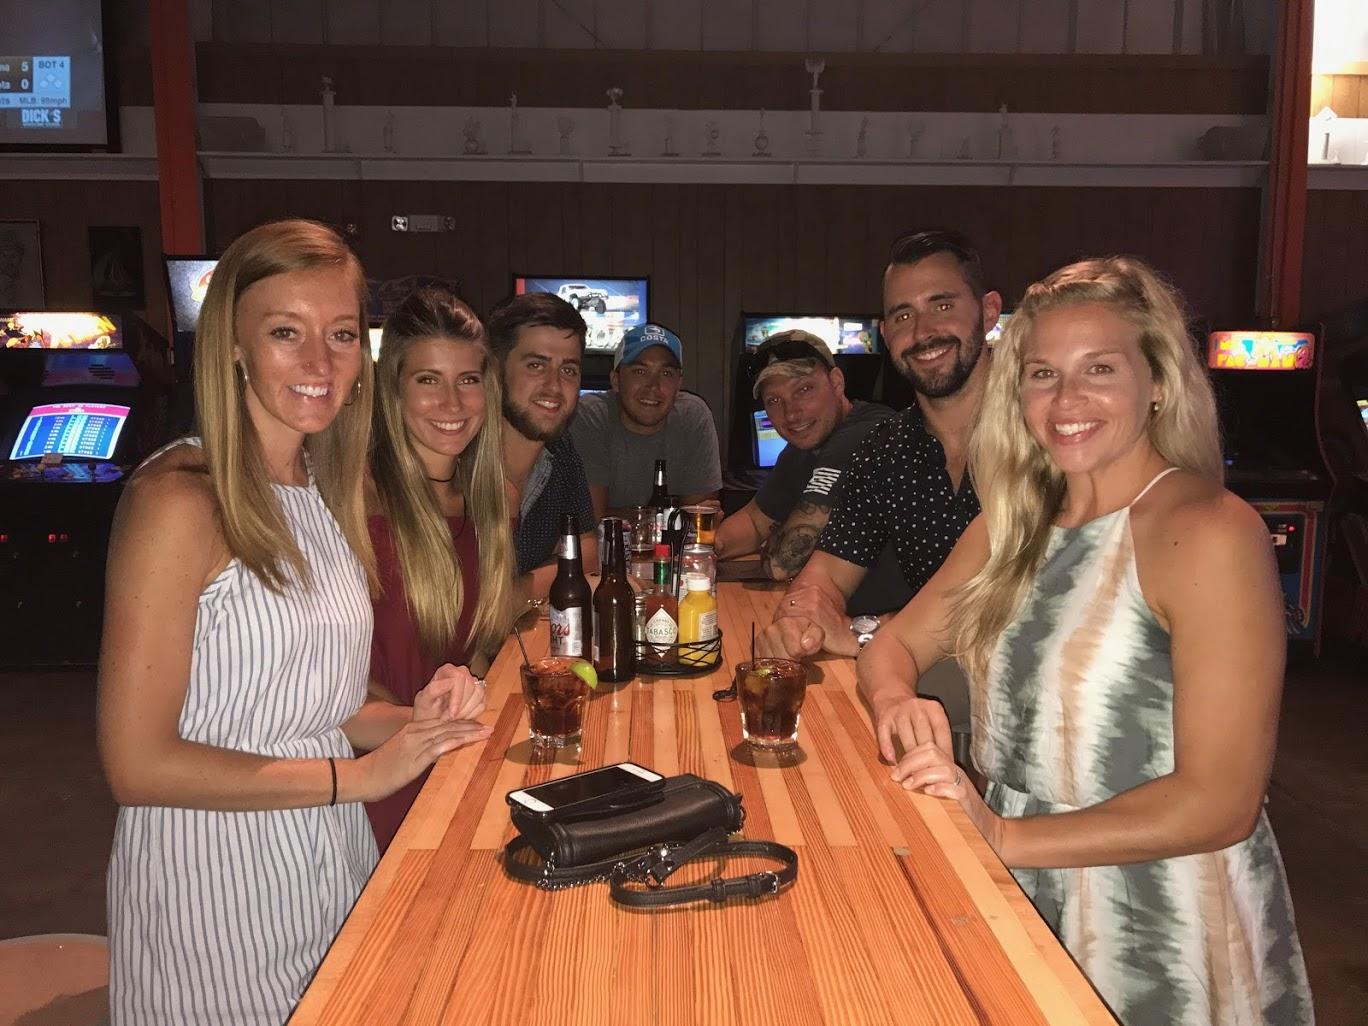 Charleston+Drinks+Cousins.JPG